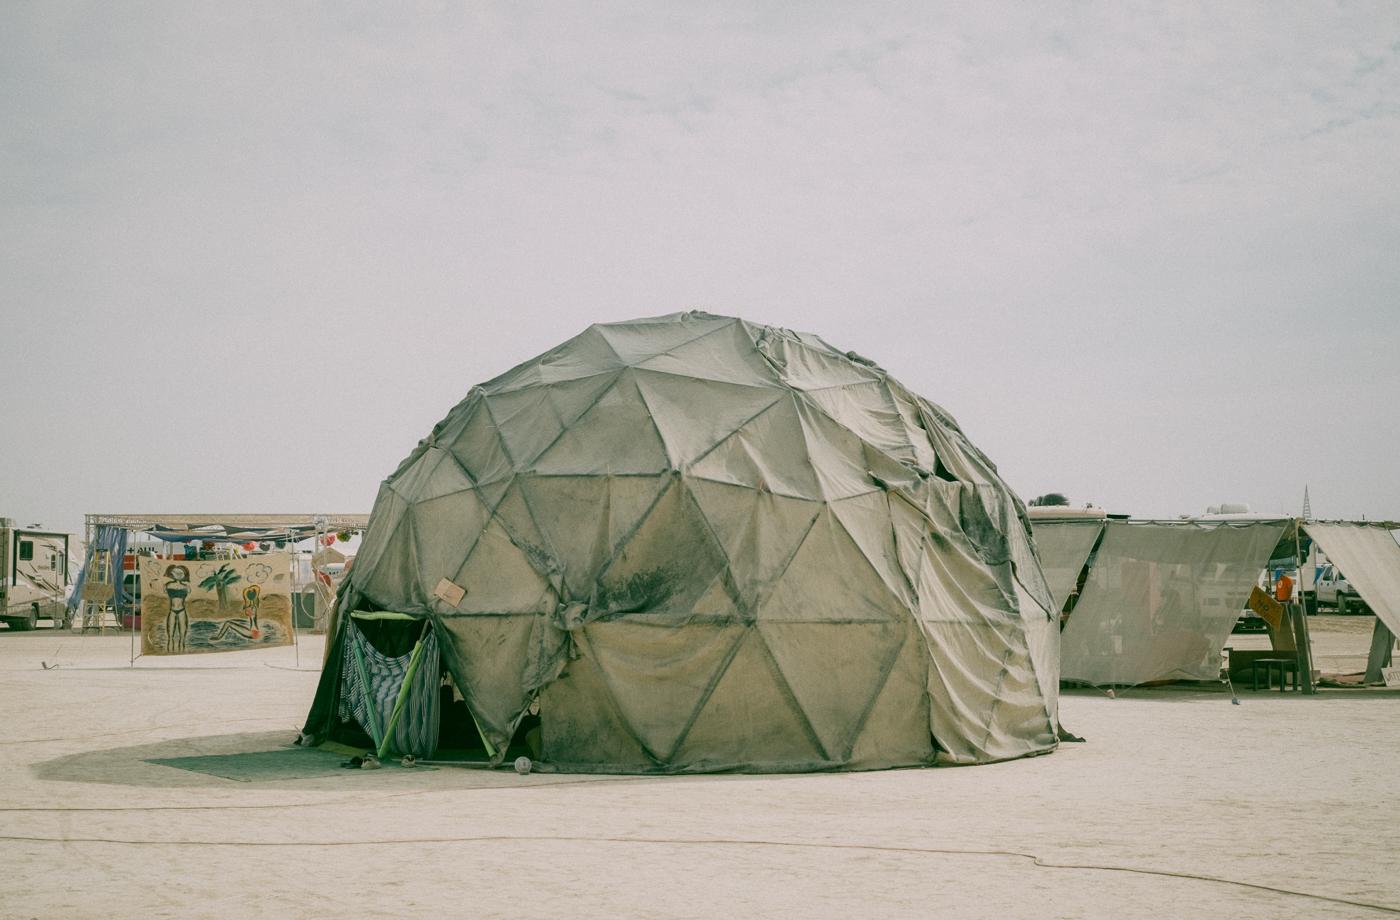 Cameltopia Dome